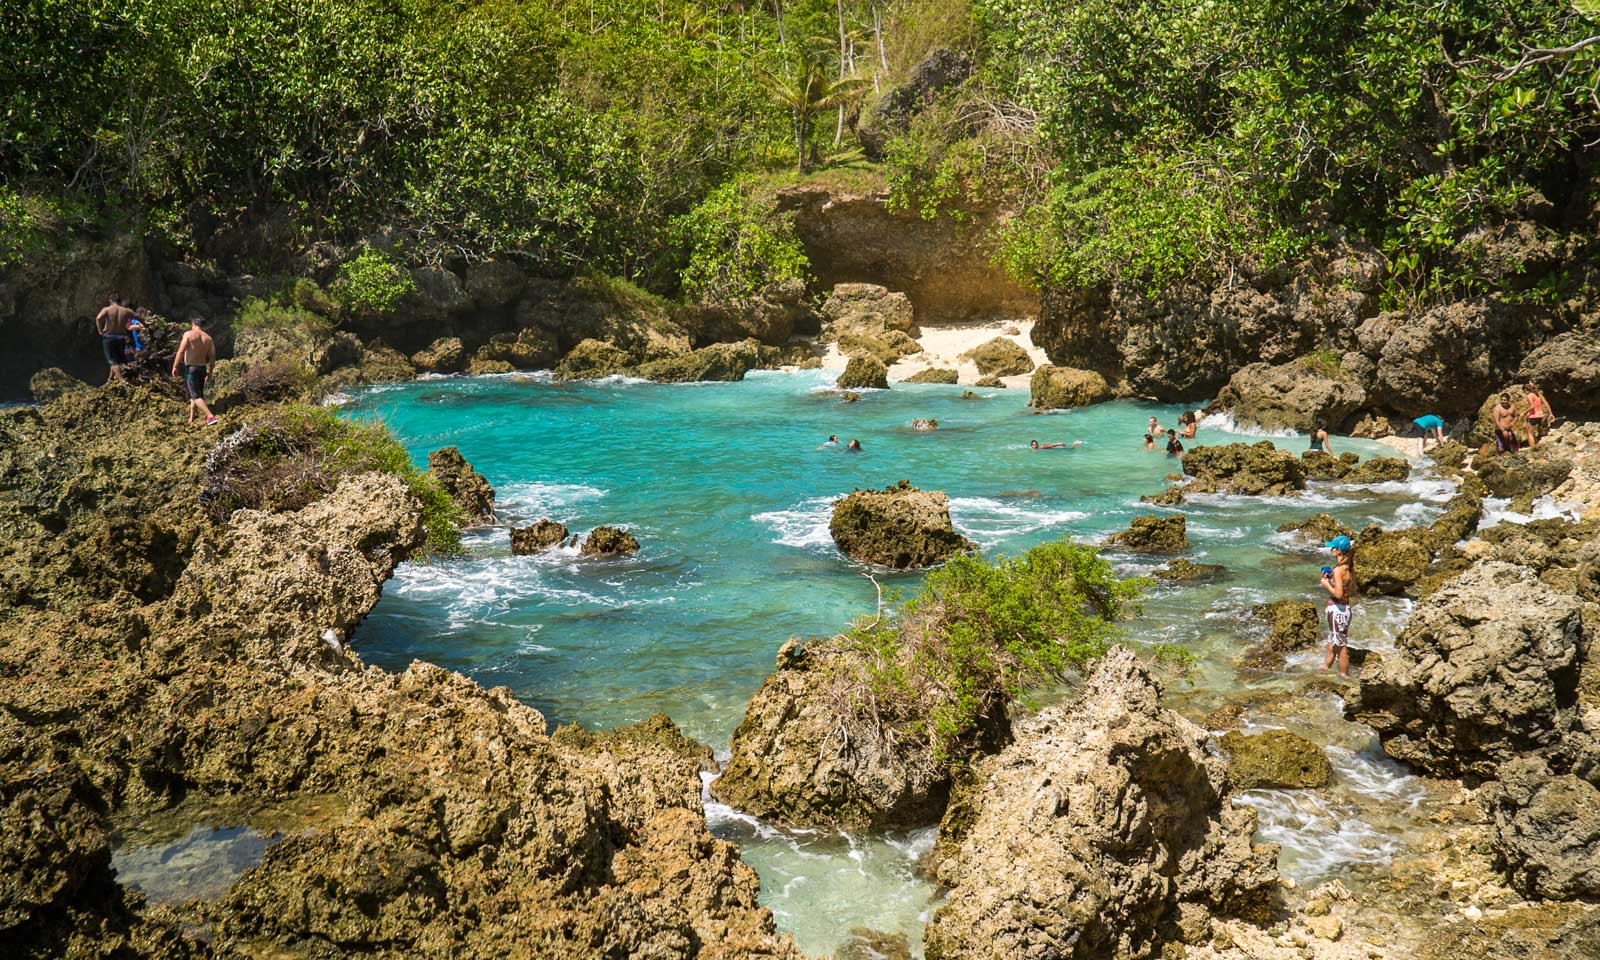 Ague Cove, Guam